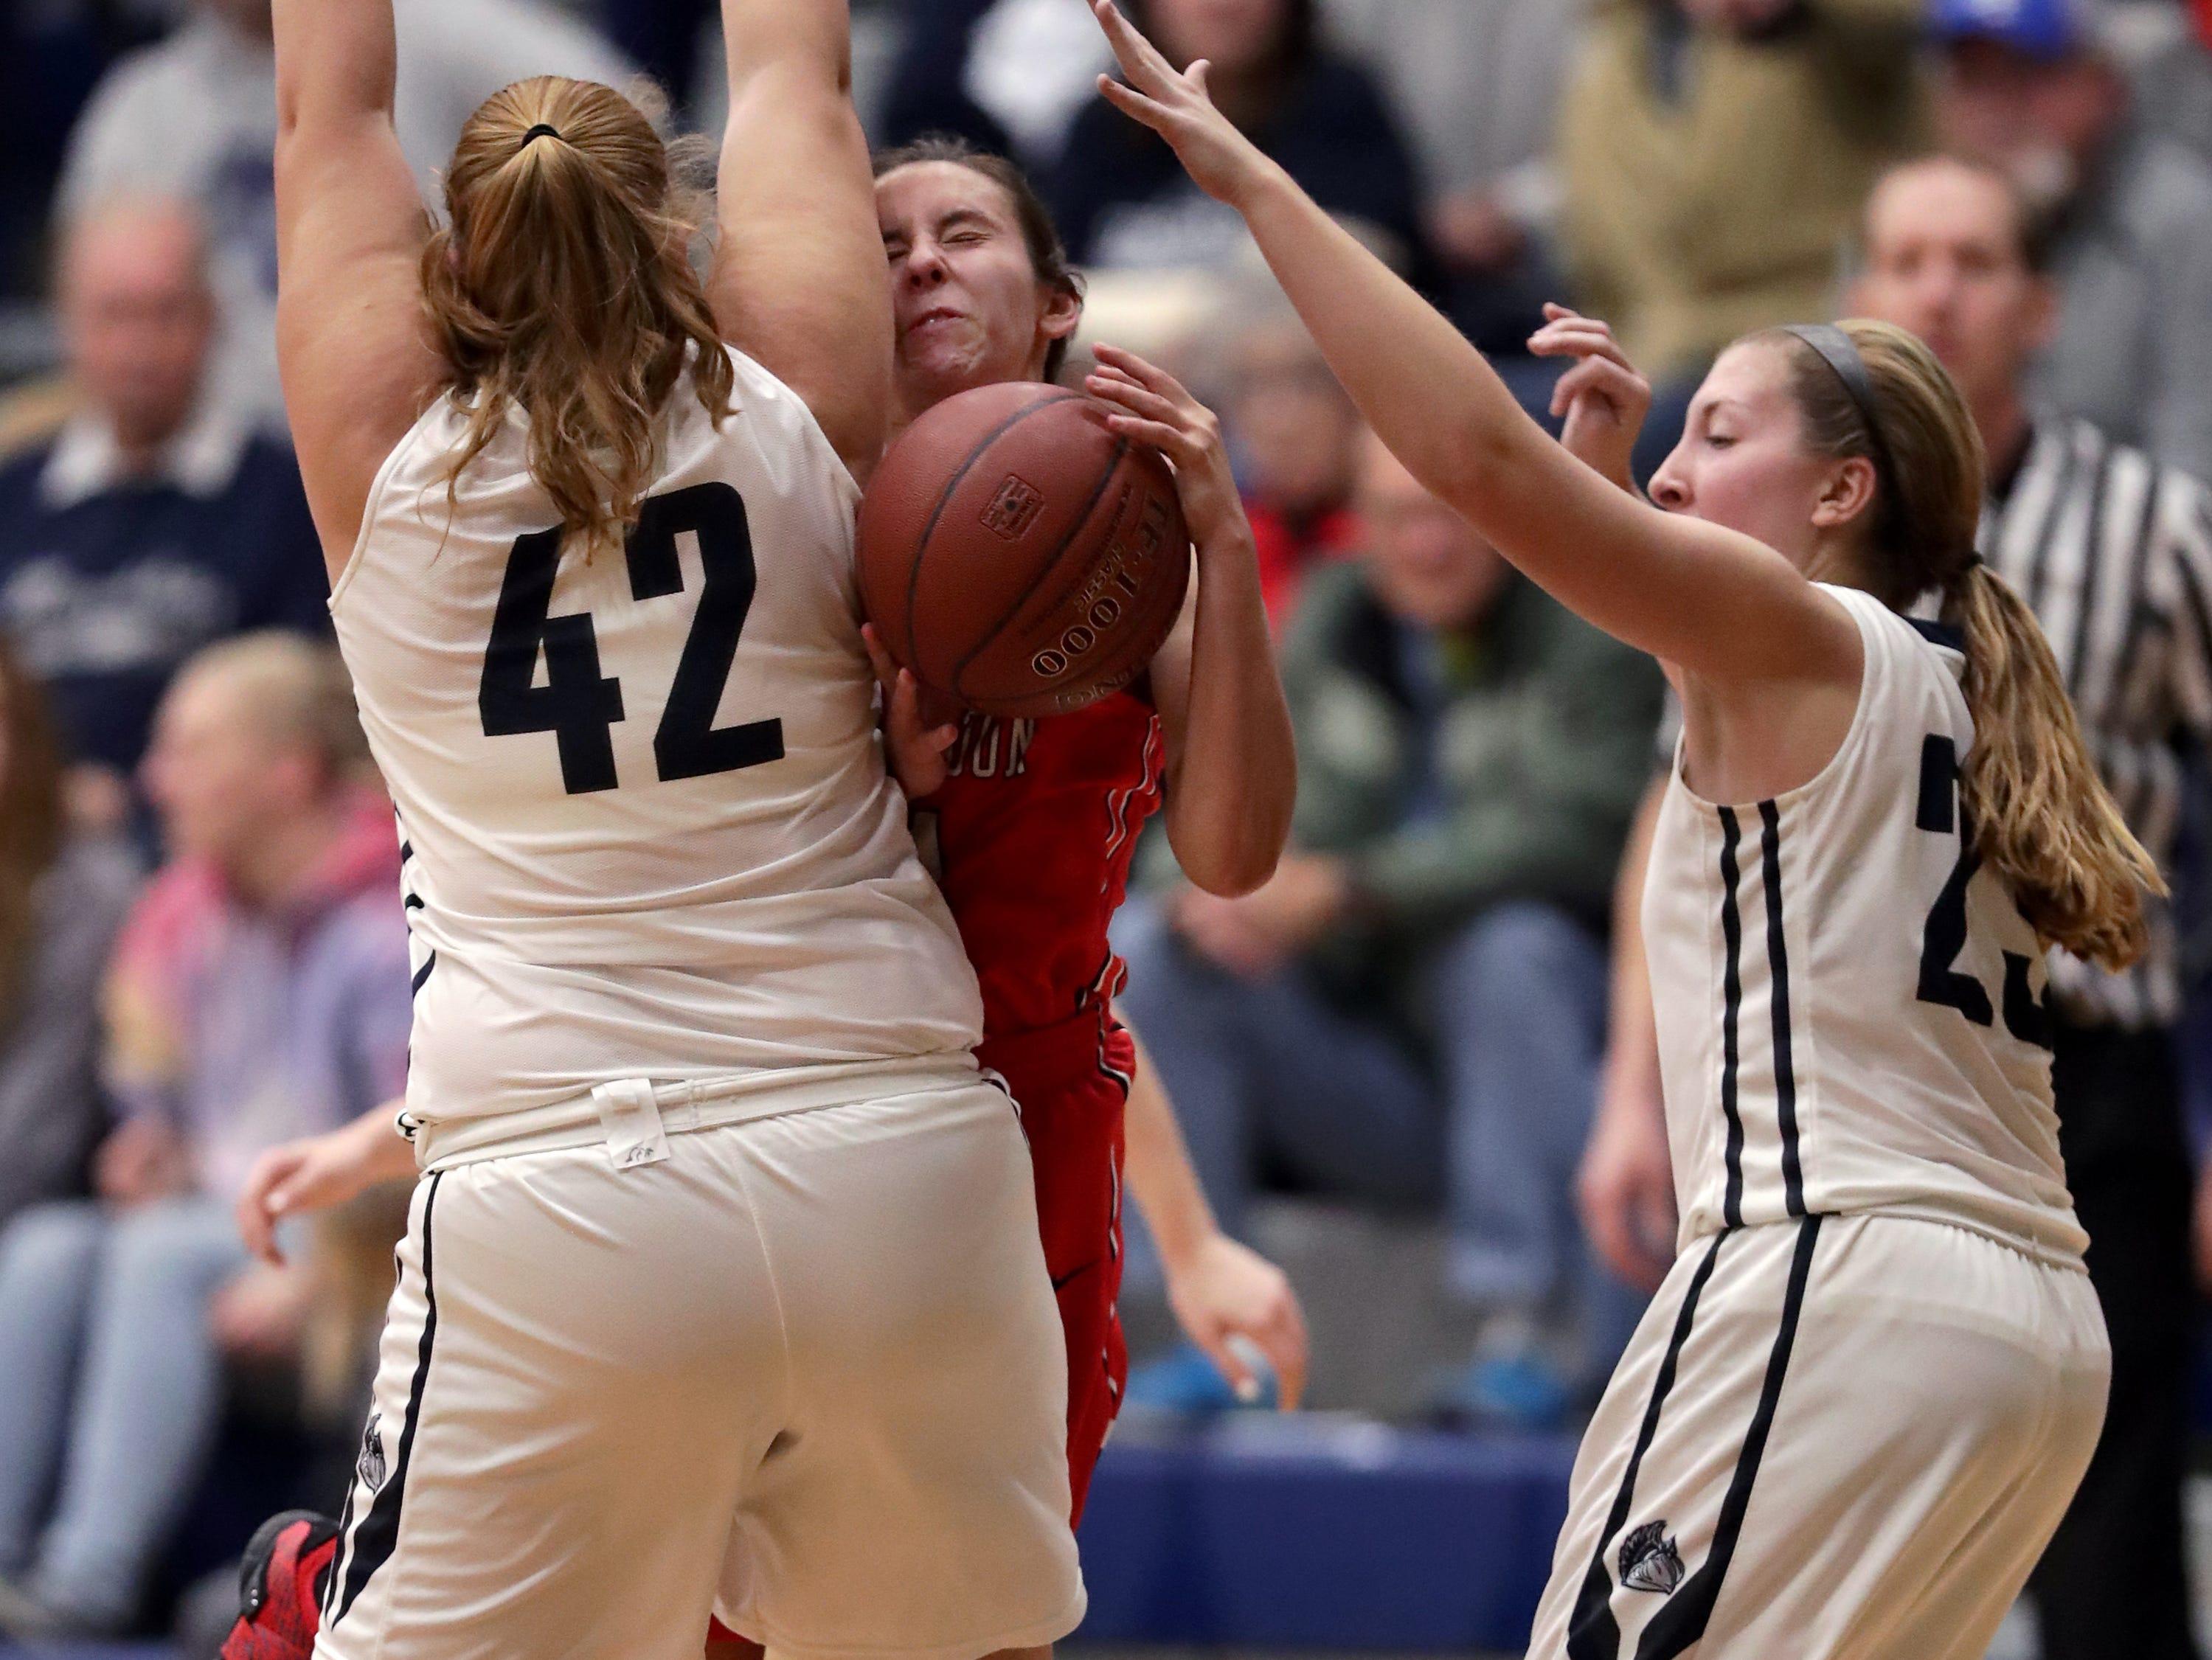 New London High School's #24 Samantha Pfefferle against Menasha High School's #42 Alyssa Rieder and #23 Alexa Yost during their girls basketball game on Friday, December 14, 2018, in Menasha, Wis.Wm. Glasheen/USA TODAY NETWORK-Wisconsin.